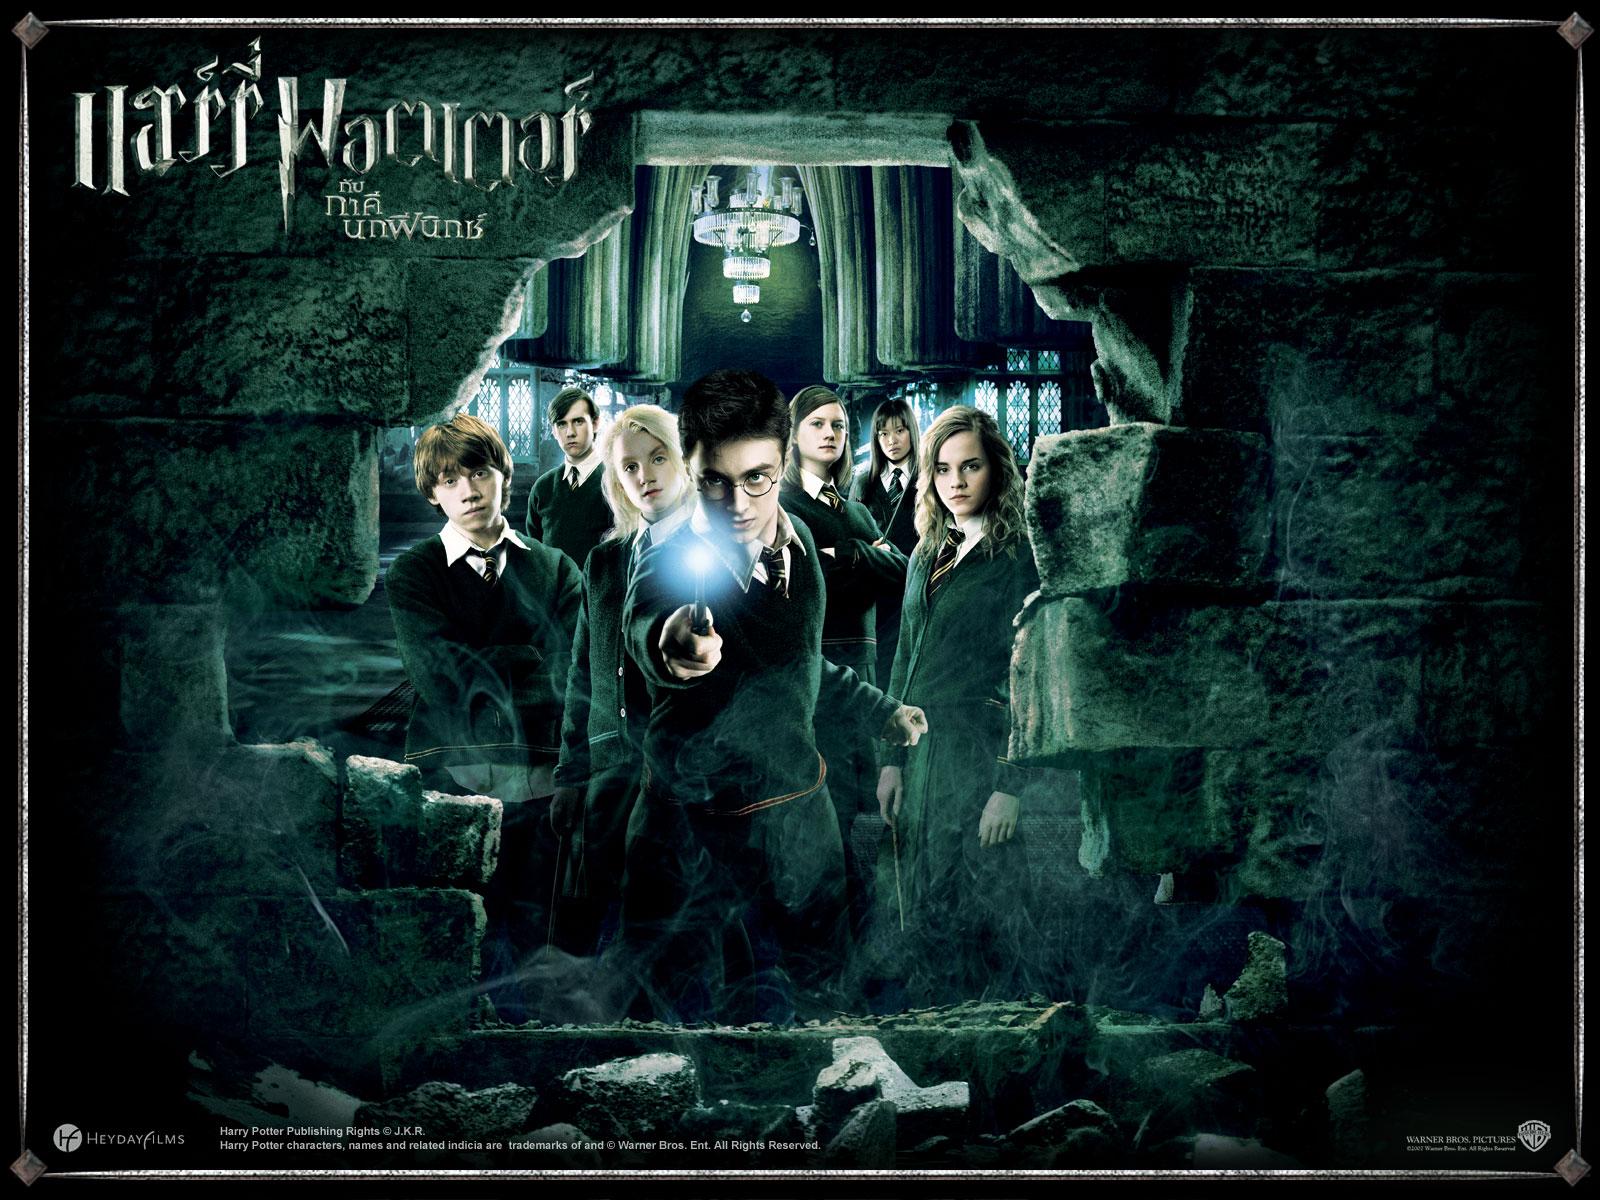 Beautiful Wallpaper Harry Potter Logo - Harry-Potter-Fanfictions-image-harry-potter-fanfictions-36146272-1600-1200  Perfect Image Reference_76755.jpg